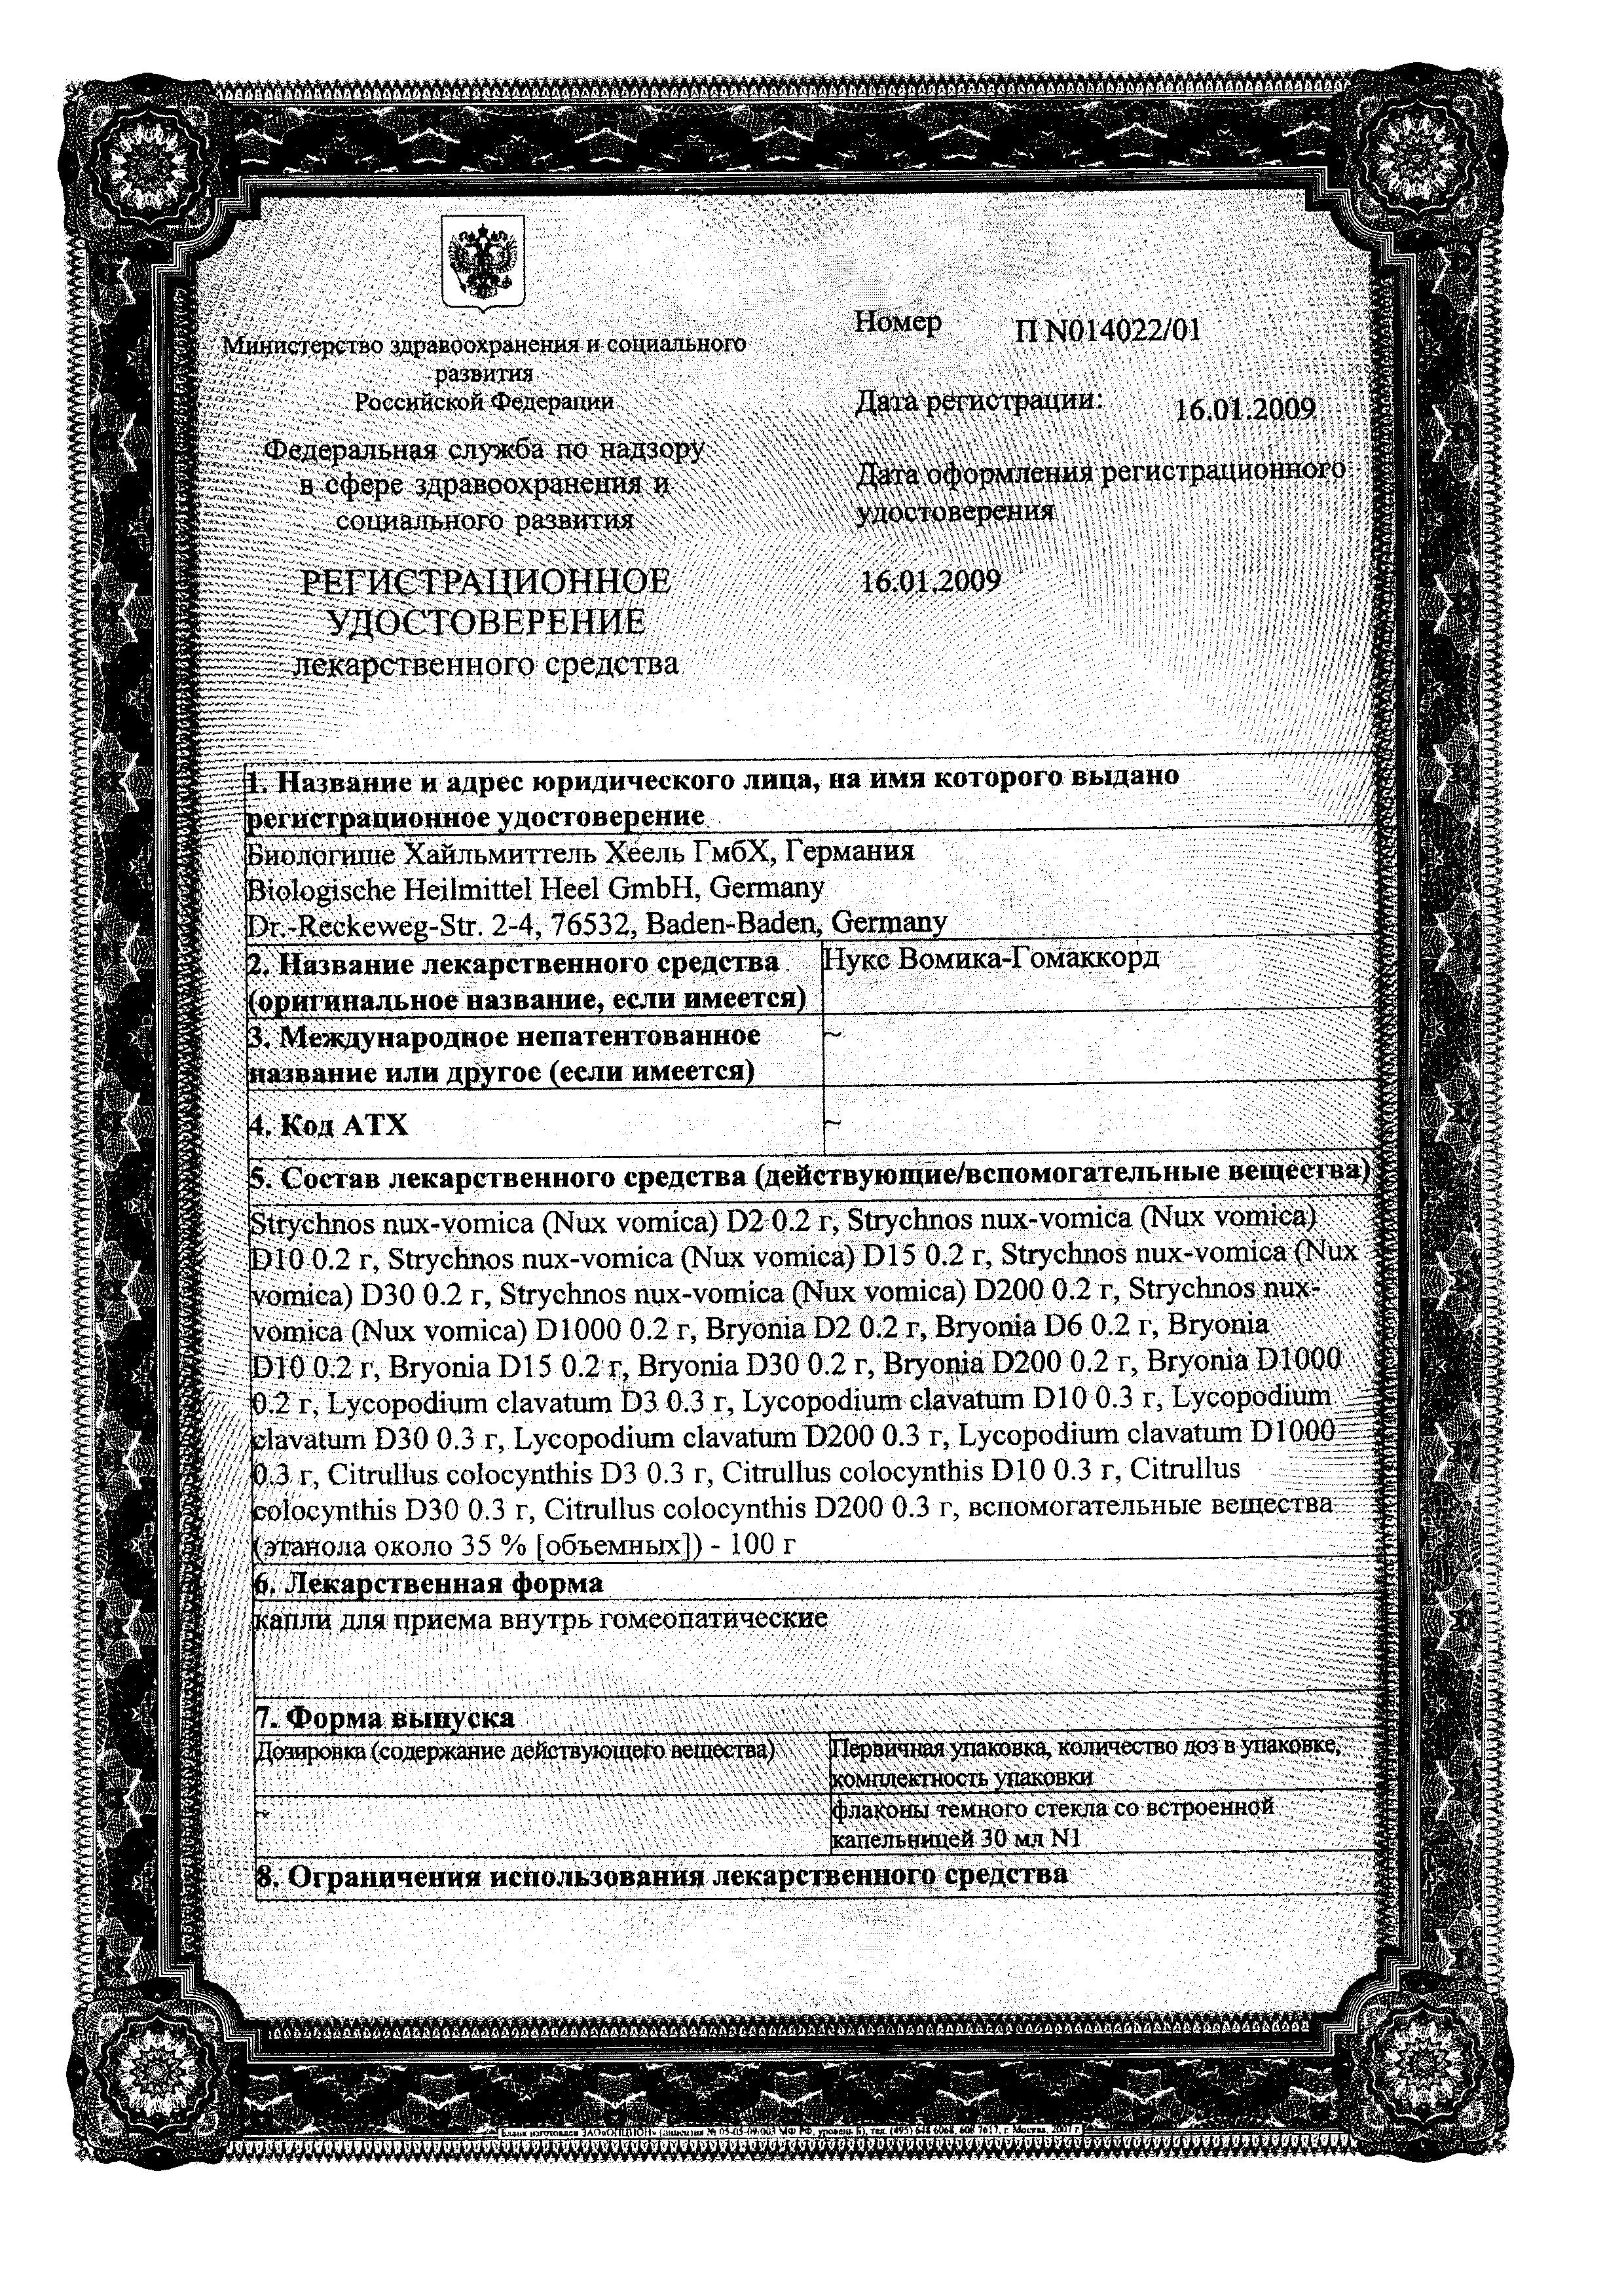 Нукс вомика-Гомаккорд сертификат